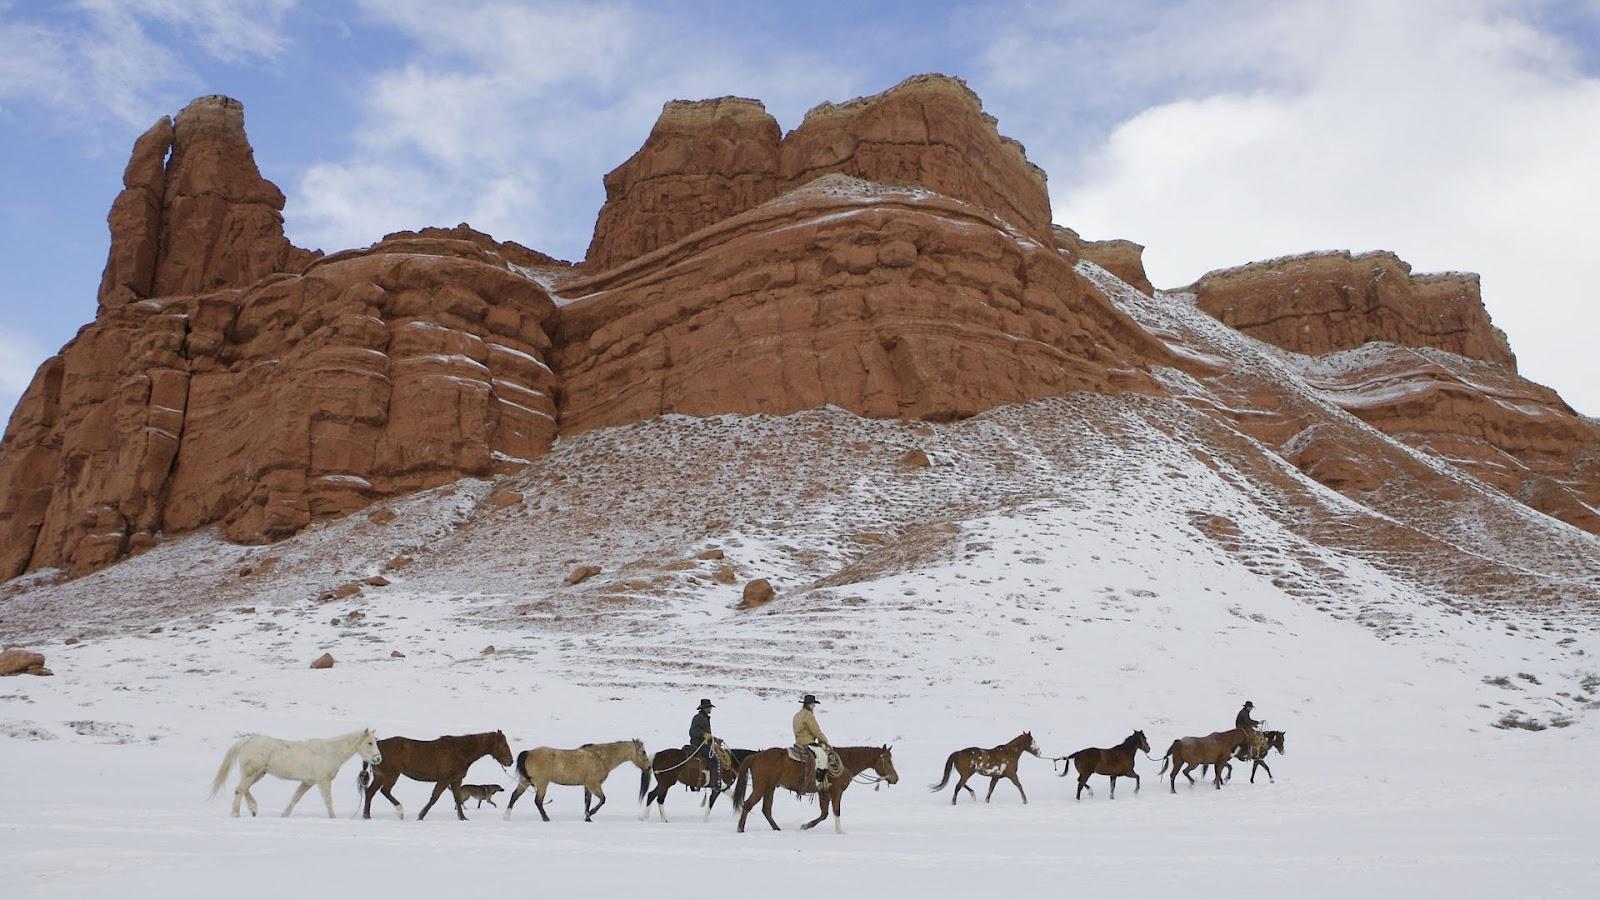 http://4.bp.blogspot.com/-HcqLVi6T3bE/Tz5PLYt6-zI/AAAAAAAADHs/rAIJnitDa50/s1600/Wranglers+In+Winter,+Shell,+Wyoming.jpg